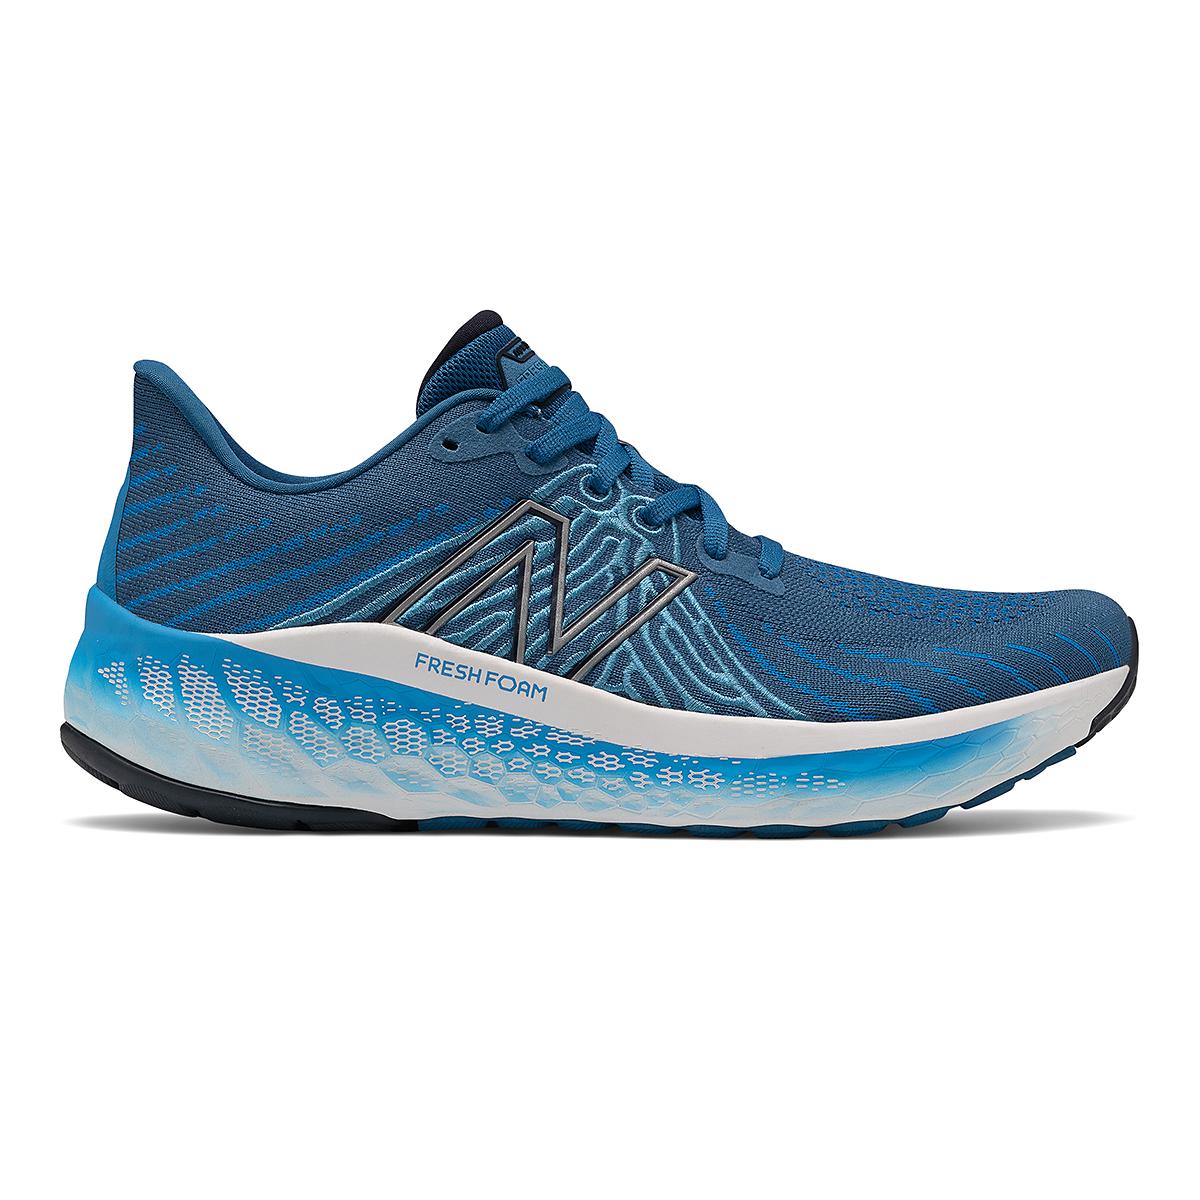 Men's New Balance Fresh Foam X Vongo V5 Running Shoe - Color: Oxygen Blue/Laser Blue - Size: 7 - Width: Wide, Oxygen Blue/Laser Blue, large, image 1